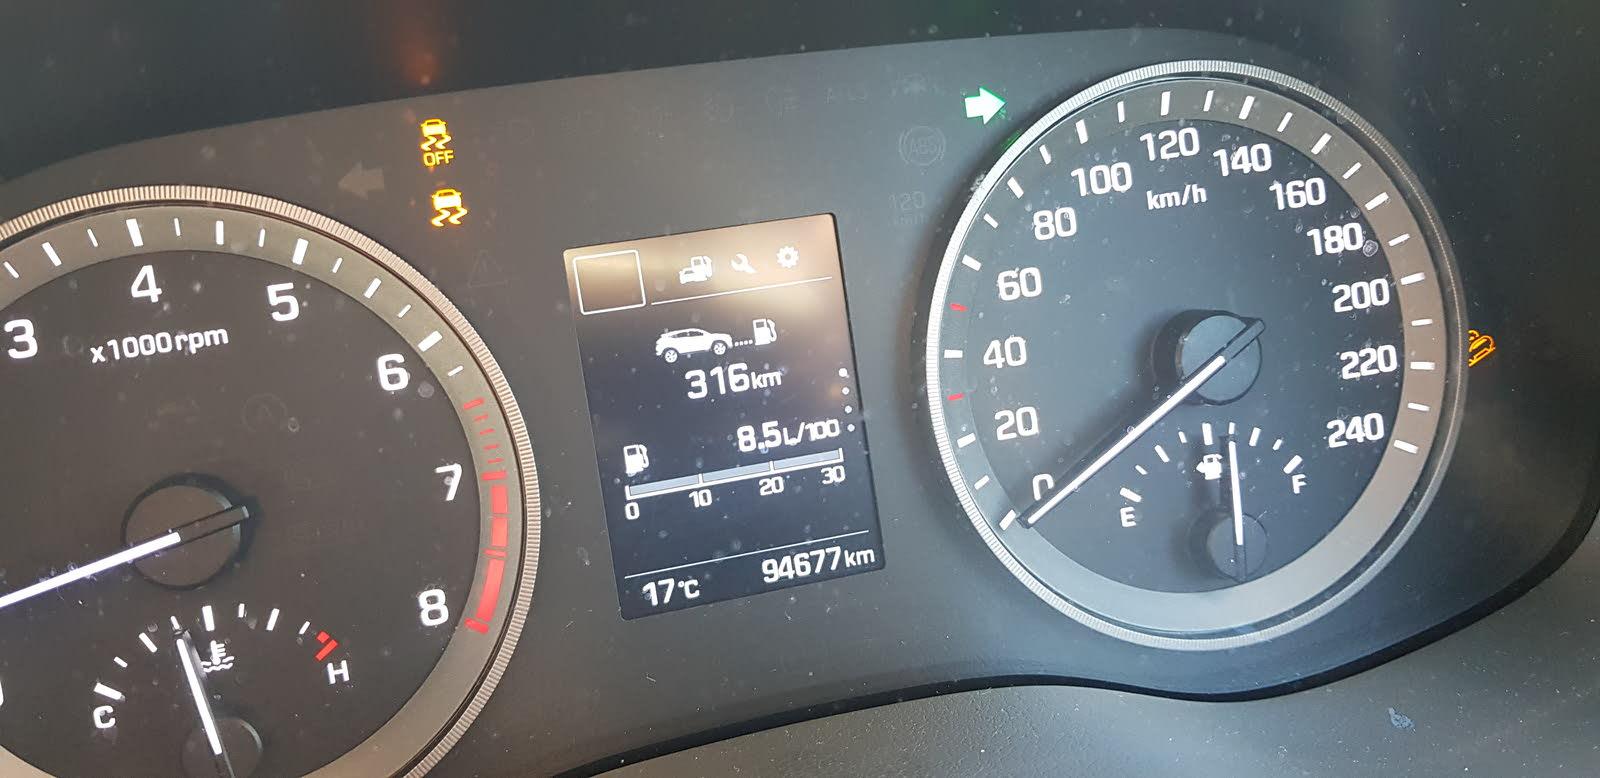 Hyundai Tucson Questions - Warning lights are on - CarGurus